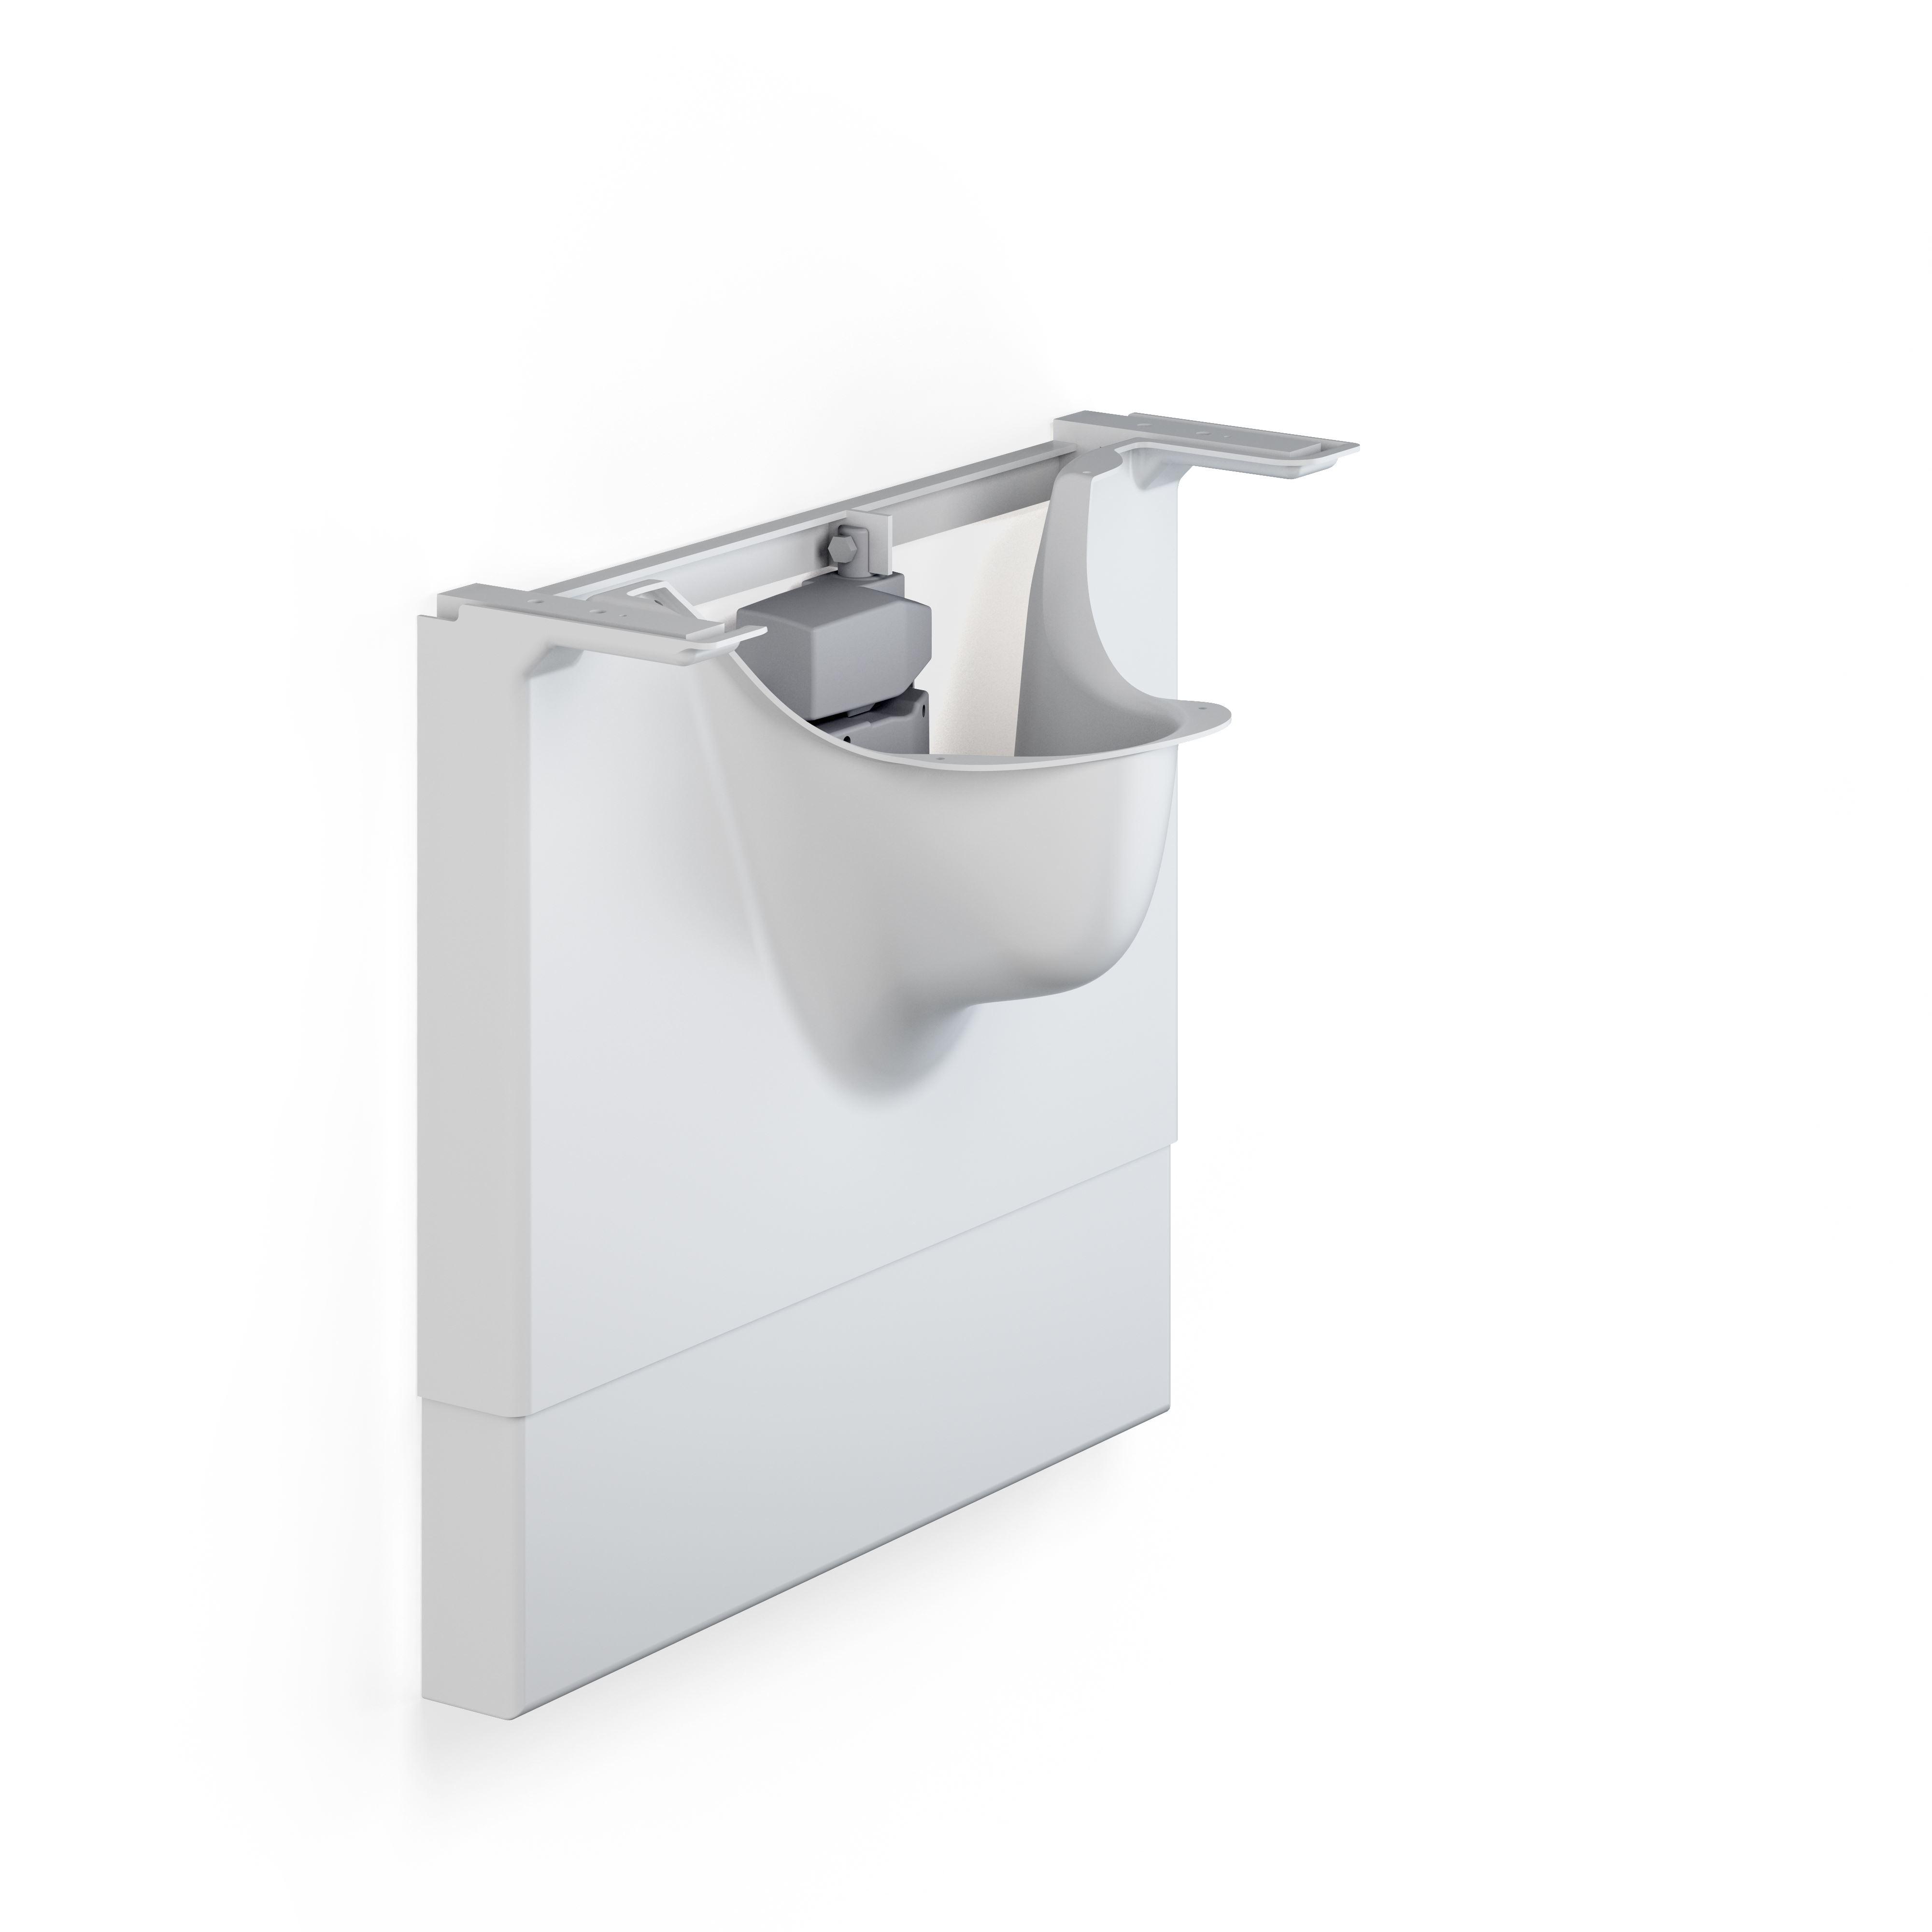 MATRIX powered basin unit, left-facing